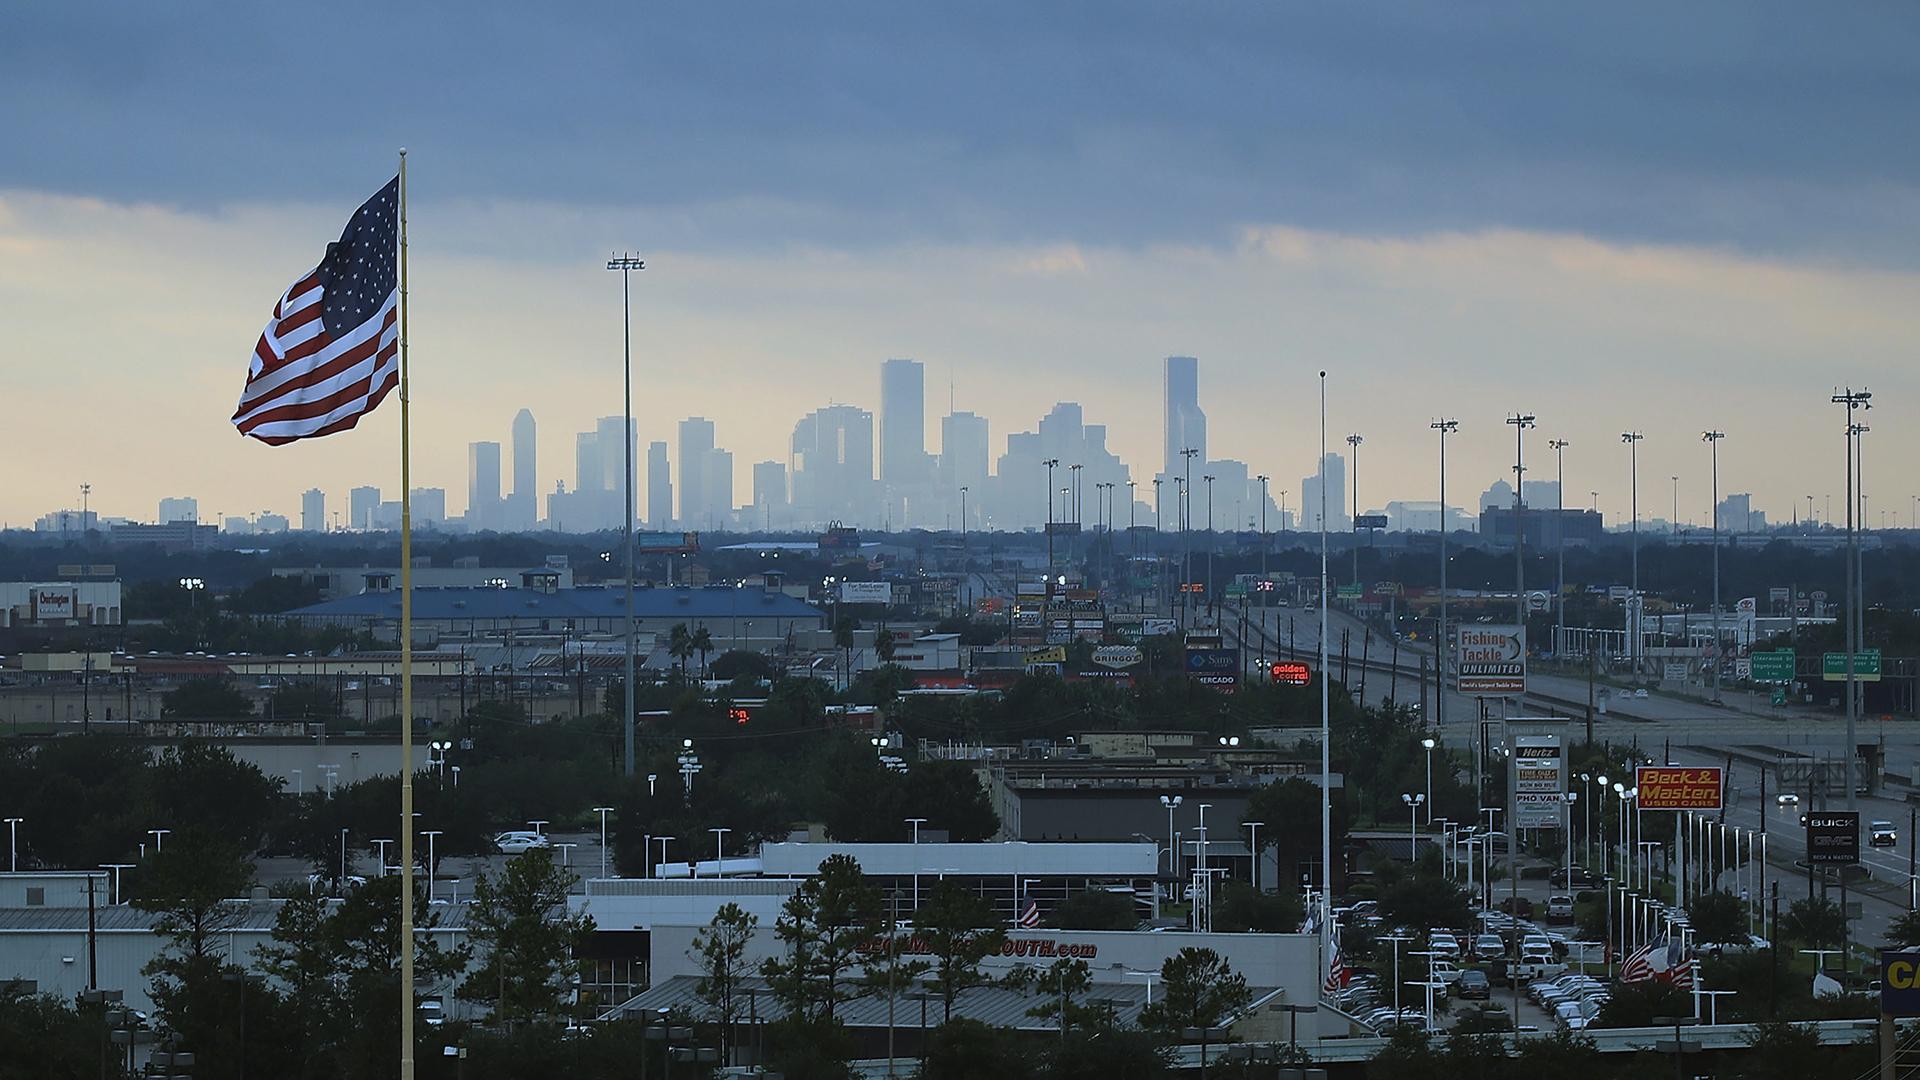 Houston skyline on Aug 29 2017 after Hurricane Harvey-159532.jpg65823662